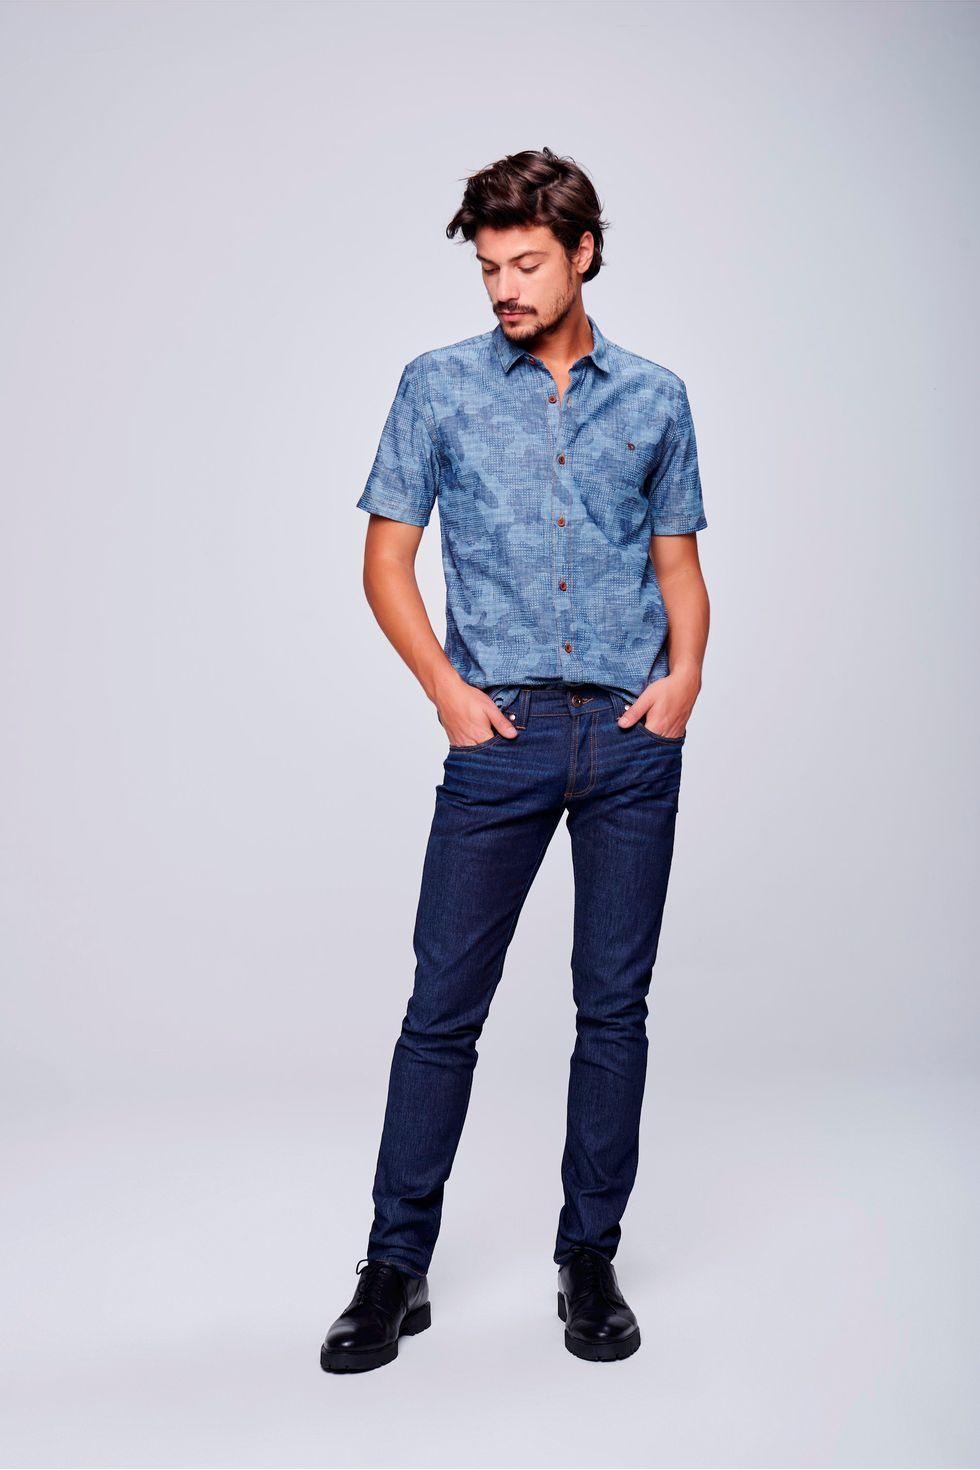 Calca-Skinny-Jeans-Masculina-Ecodamyller-Frente--